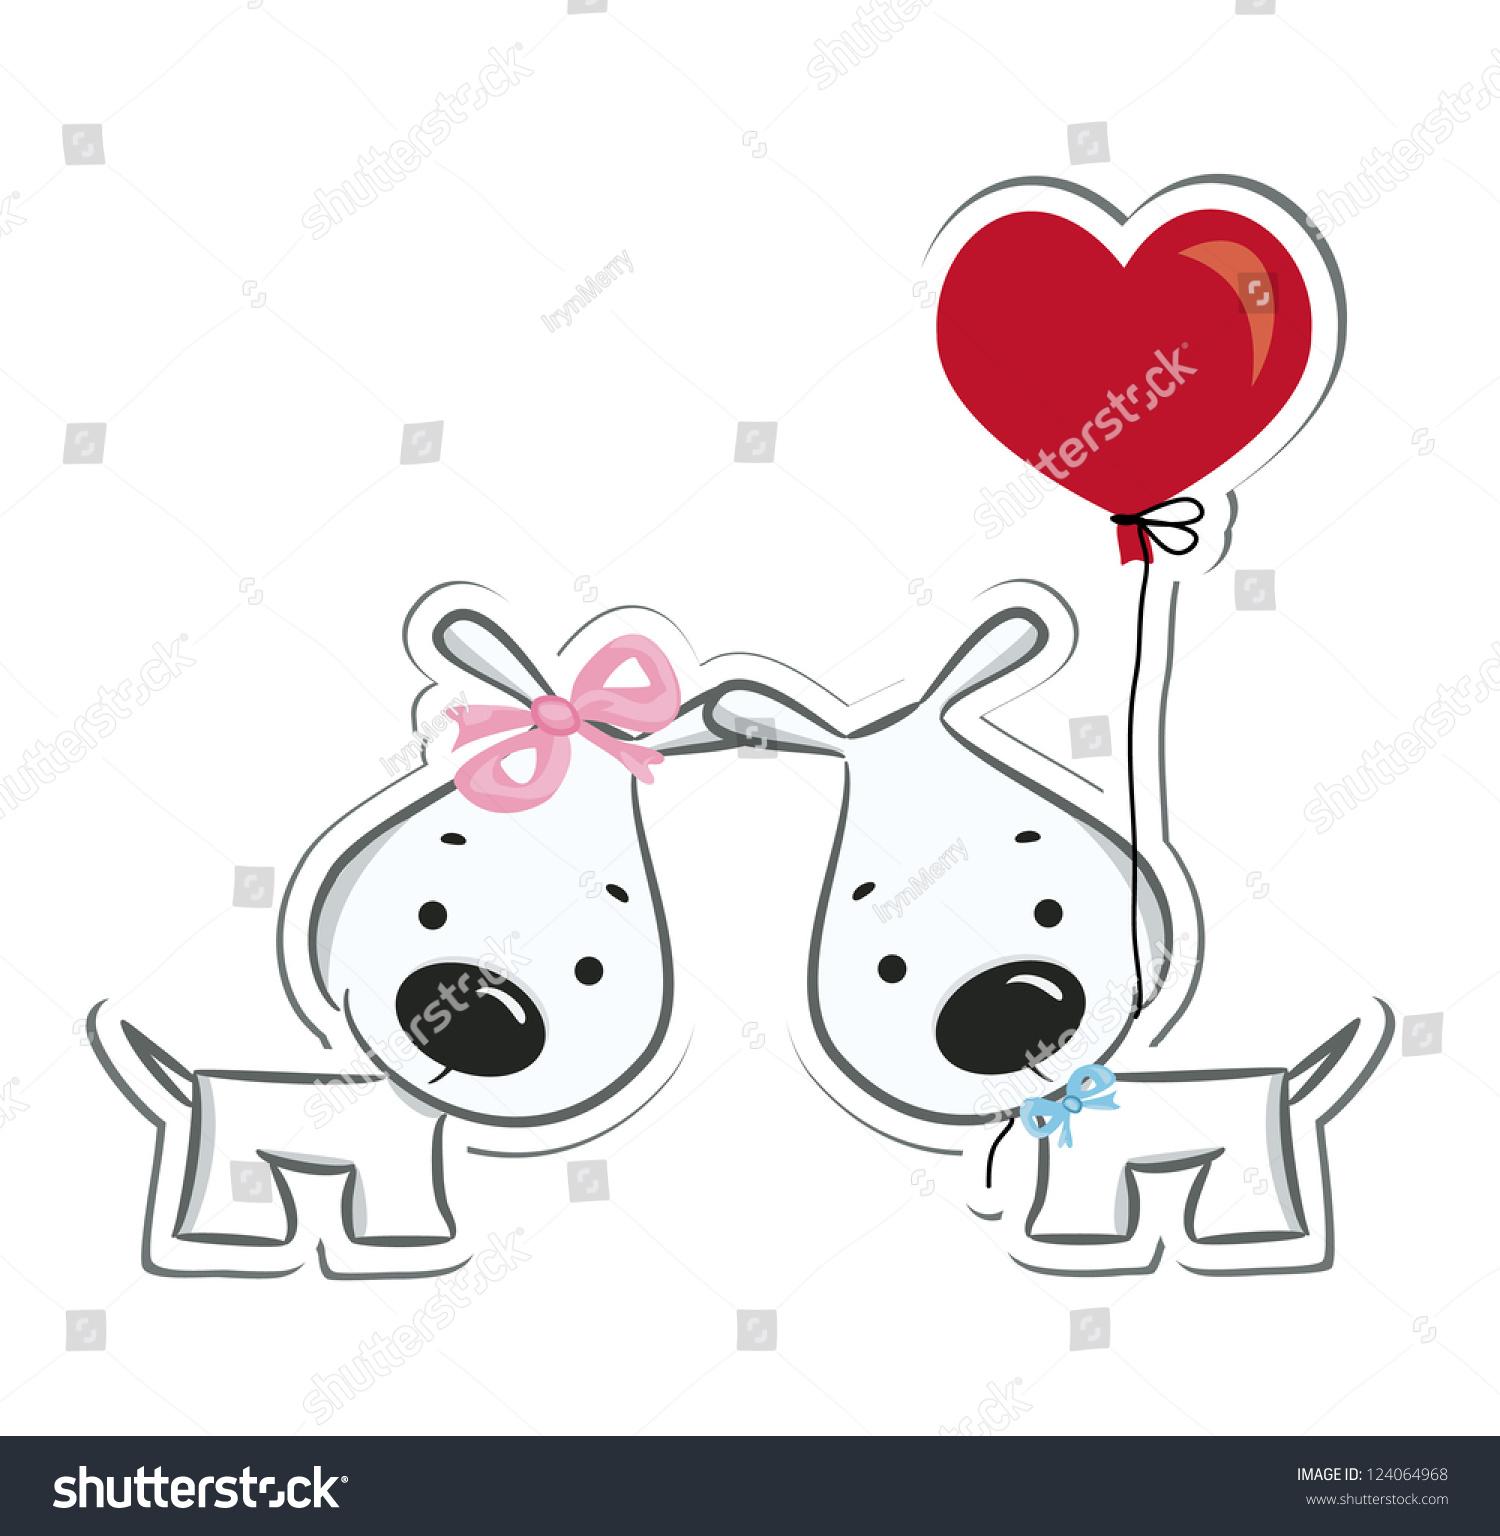 Funny Dogs Couple Love Sticker Vector Stock Vector 124064968 ... for Couple Sticker Line  193tgx